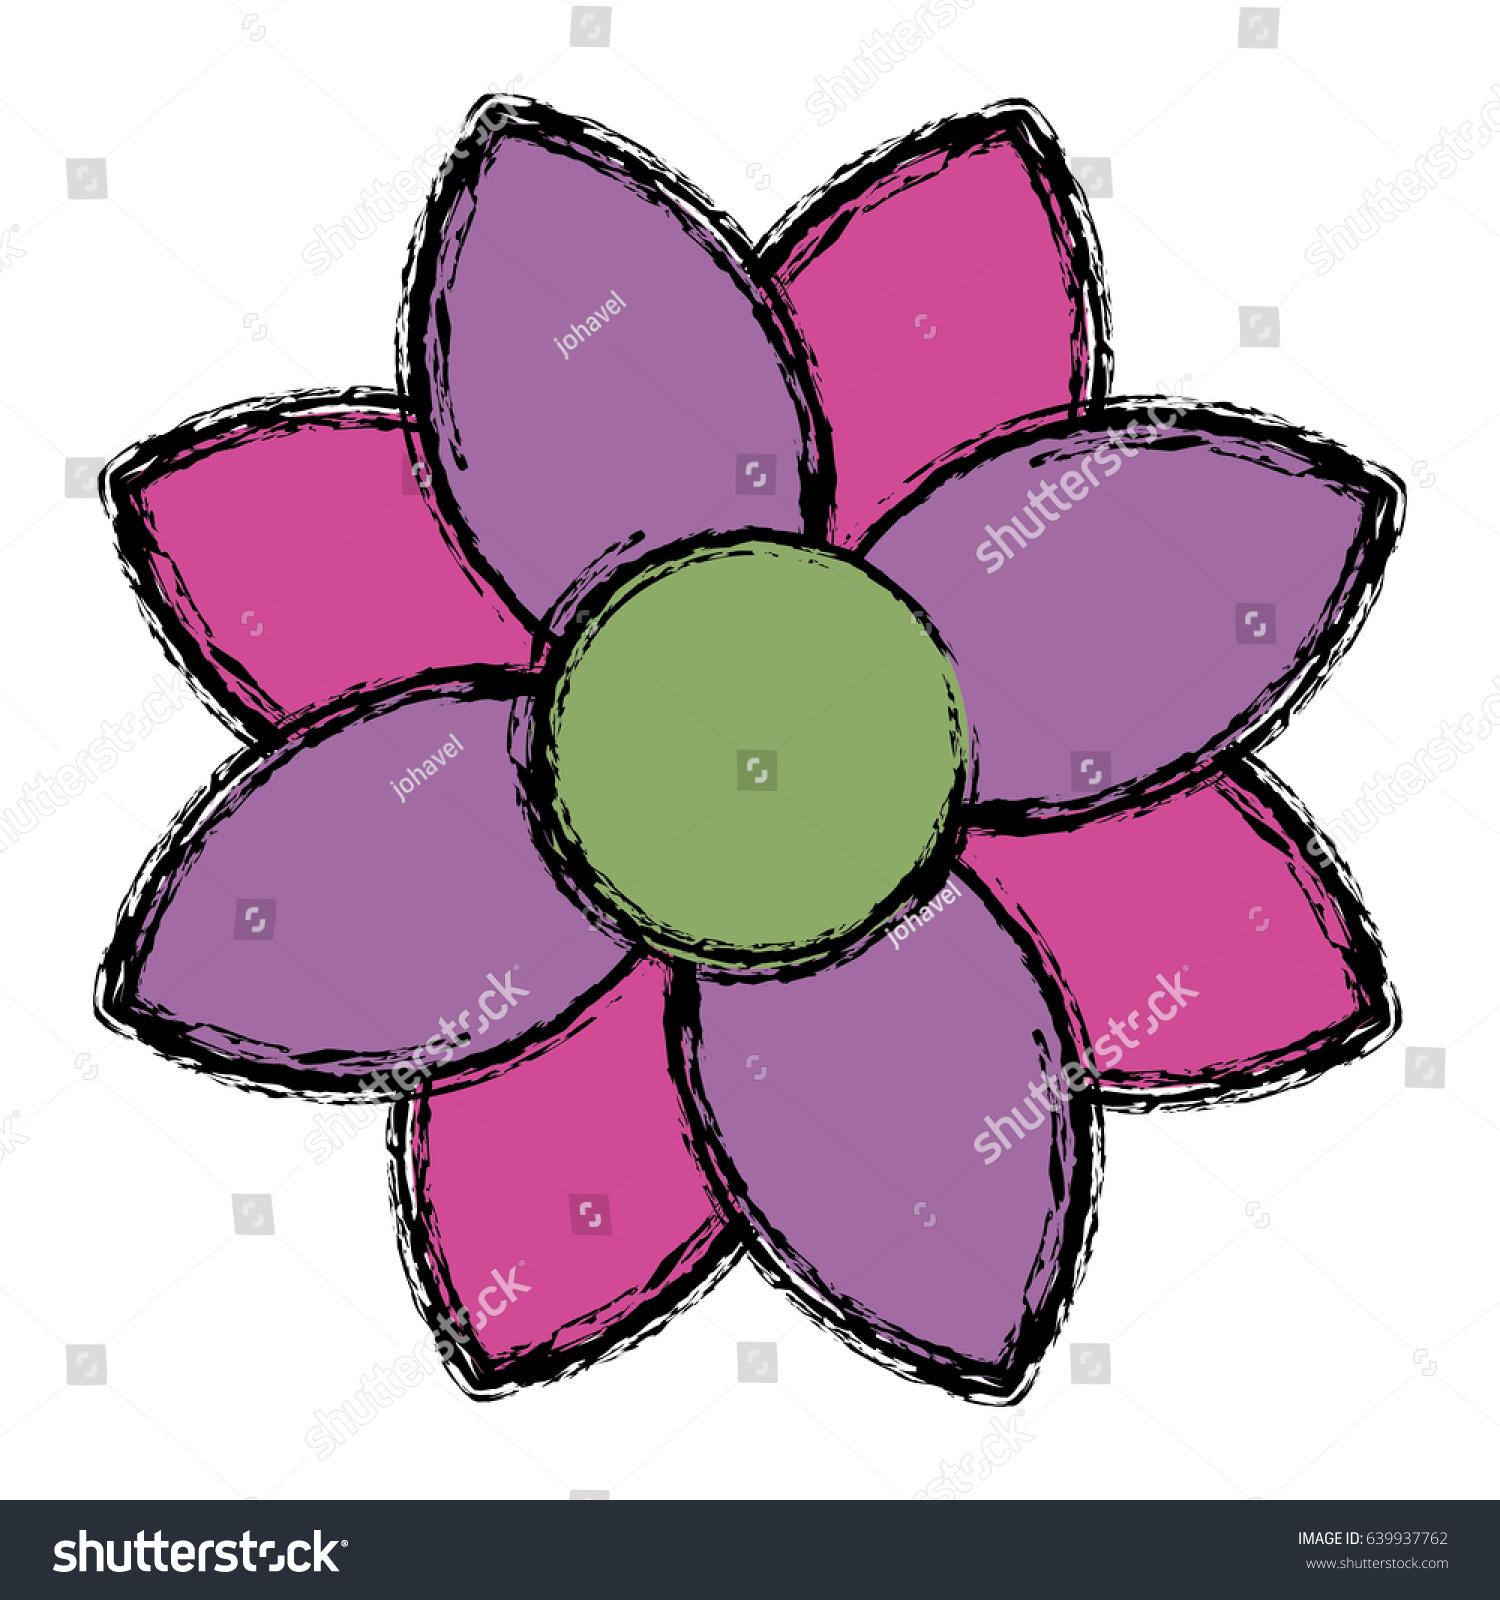 Beautiful Flowers Design Stock Vector Royalty Free 639937762